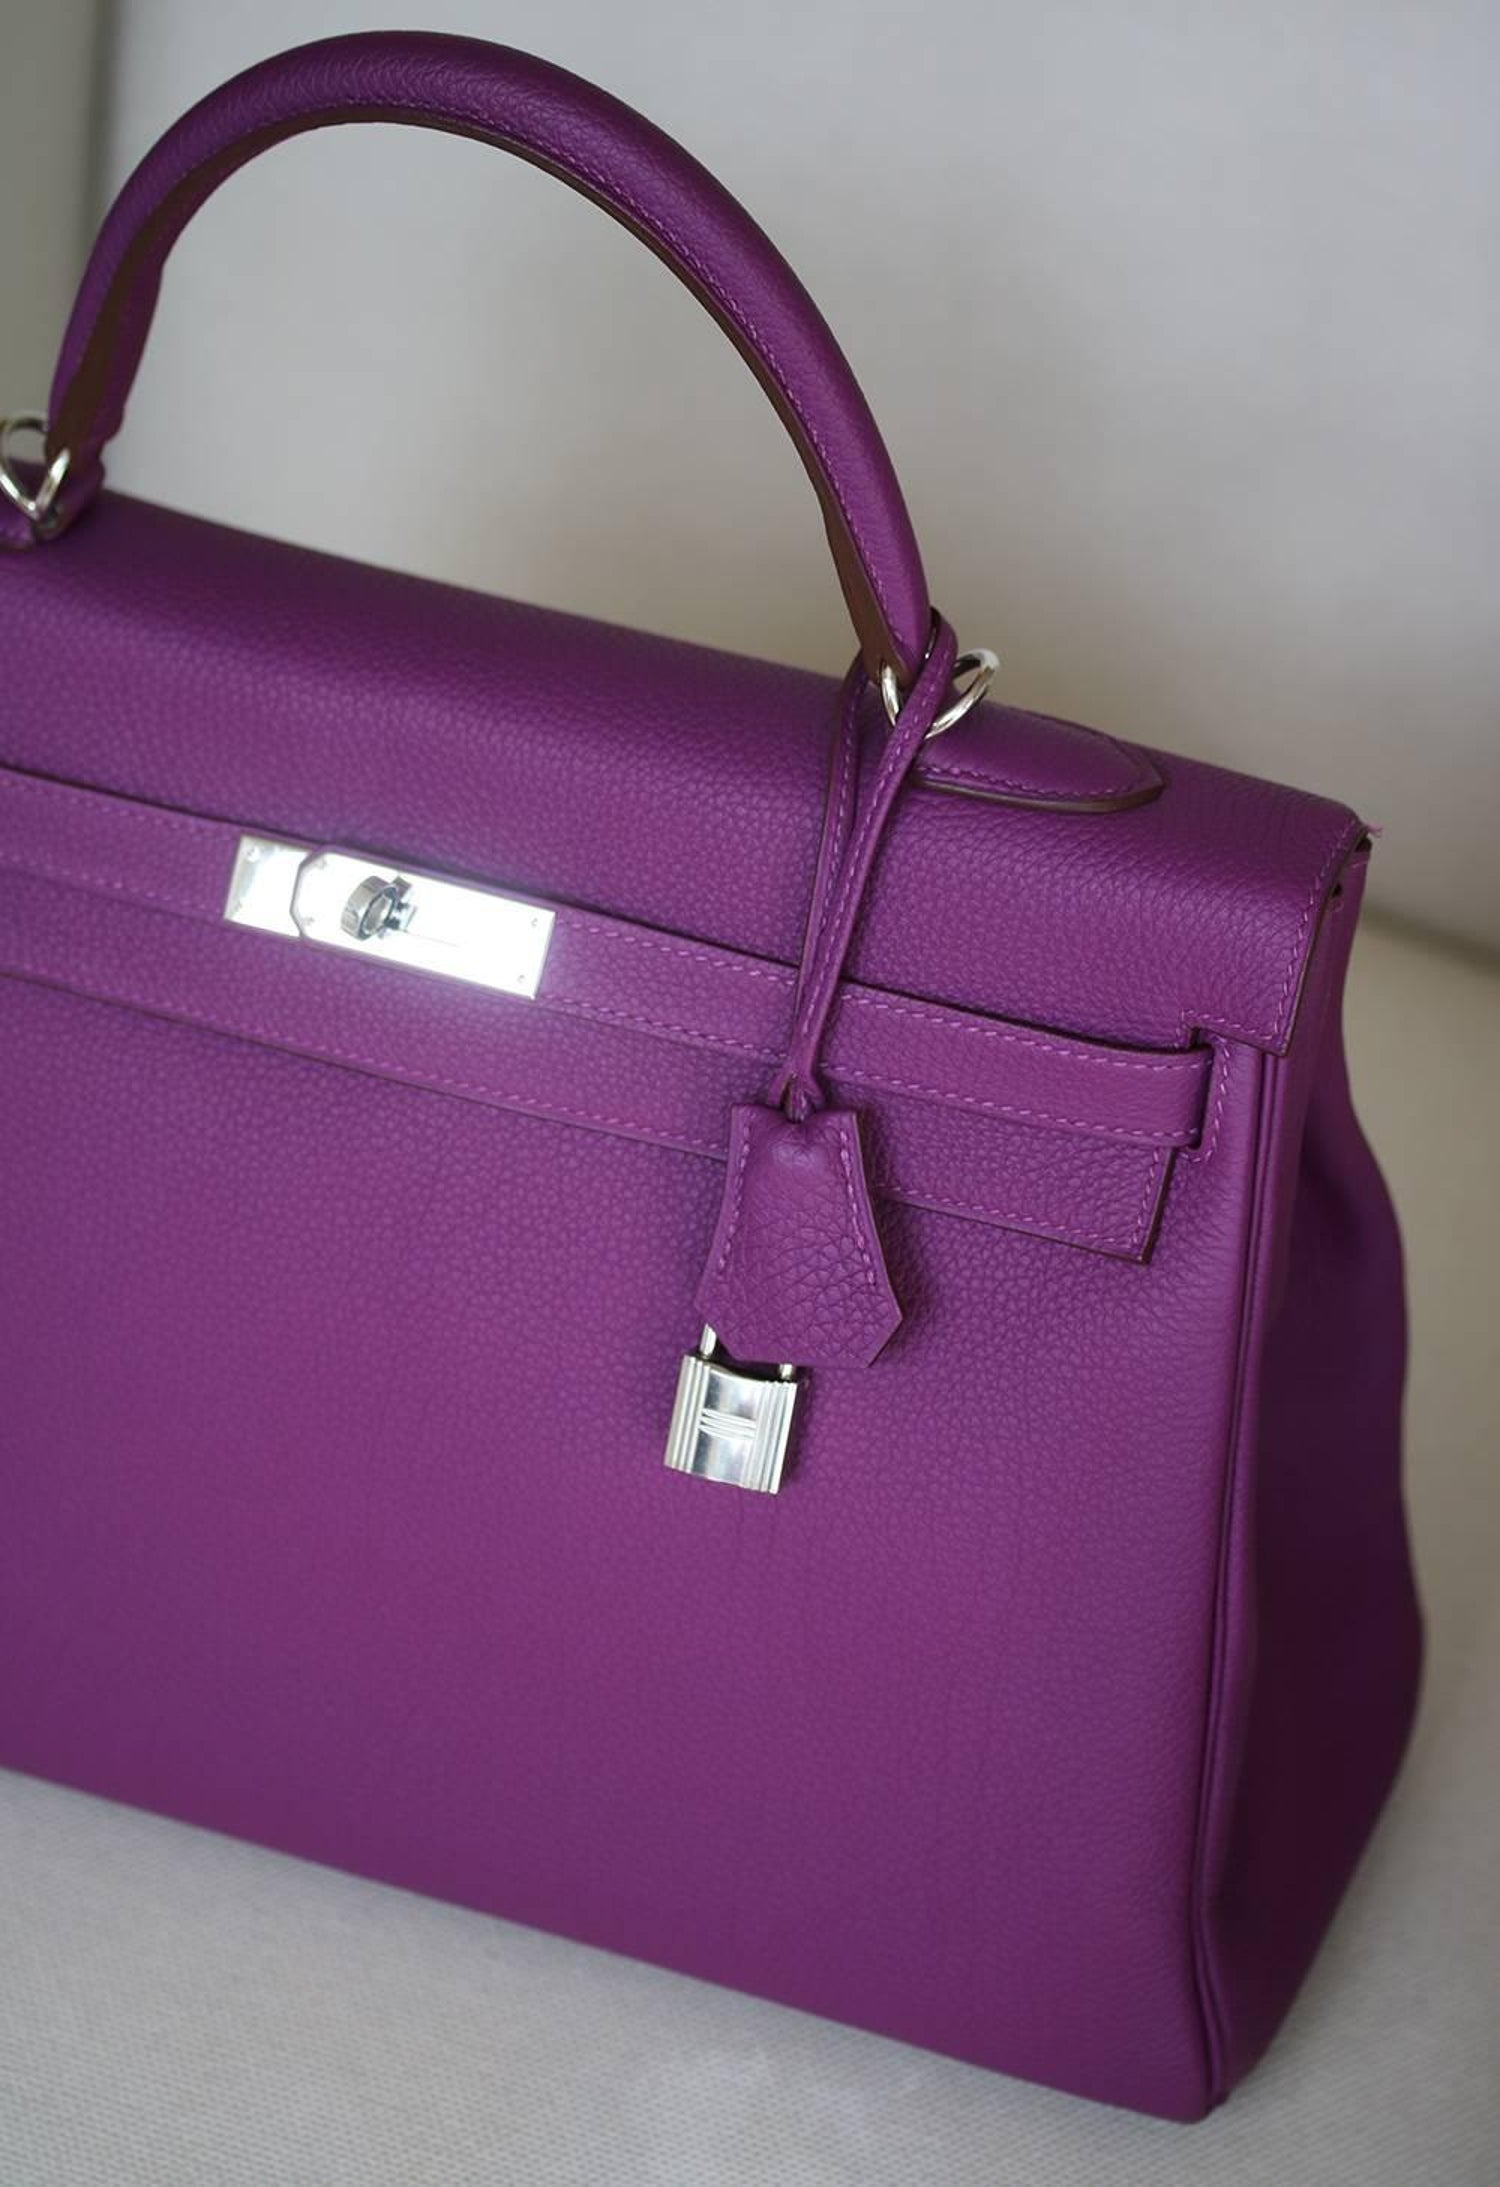 aae23e2da7e Hermès 35CM Violet Togo Leather Silver H W Kelly Bag at 1stdibs